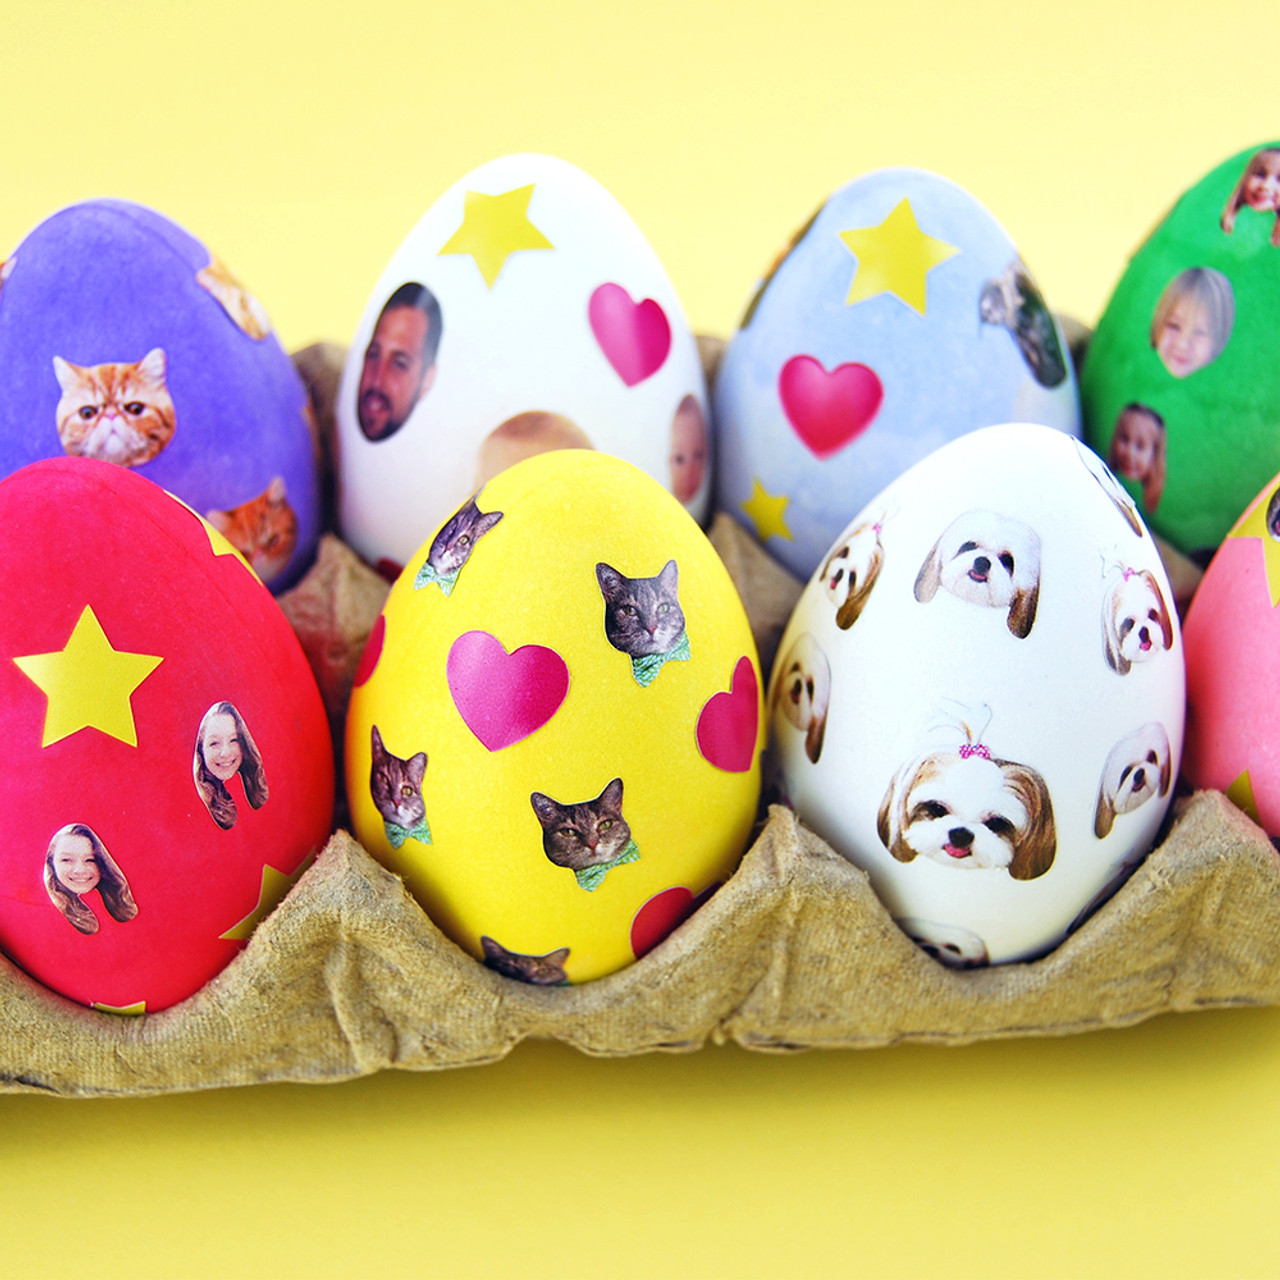 Sticker Love: DIY Stickered Easter Eggs